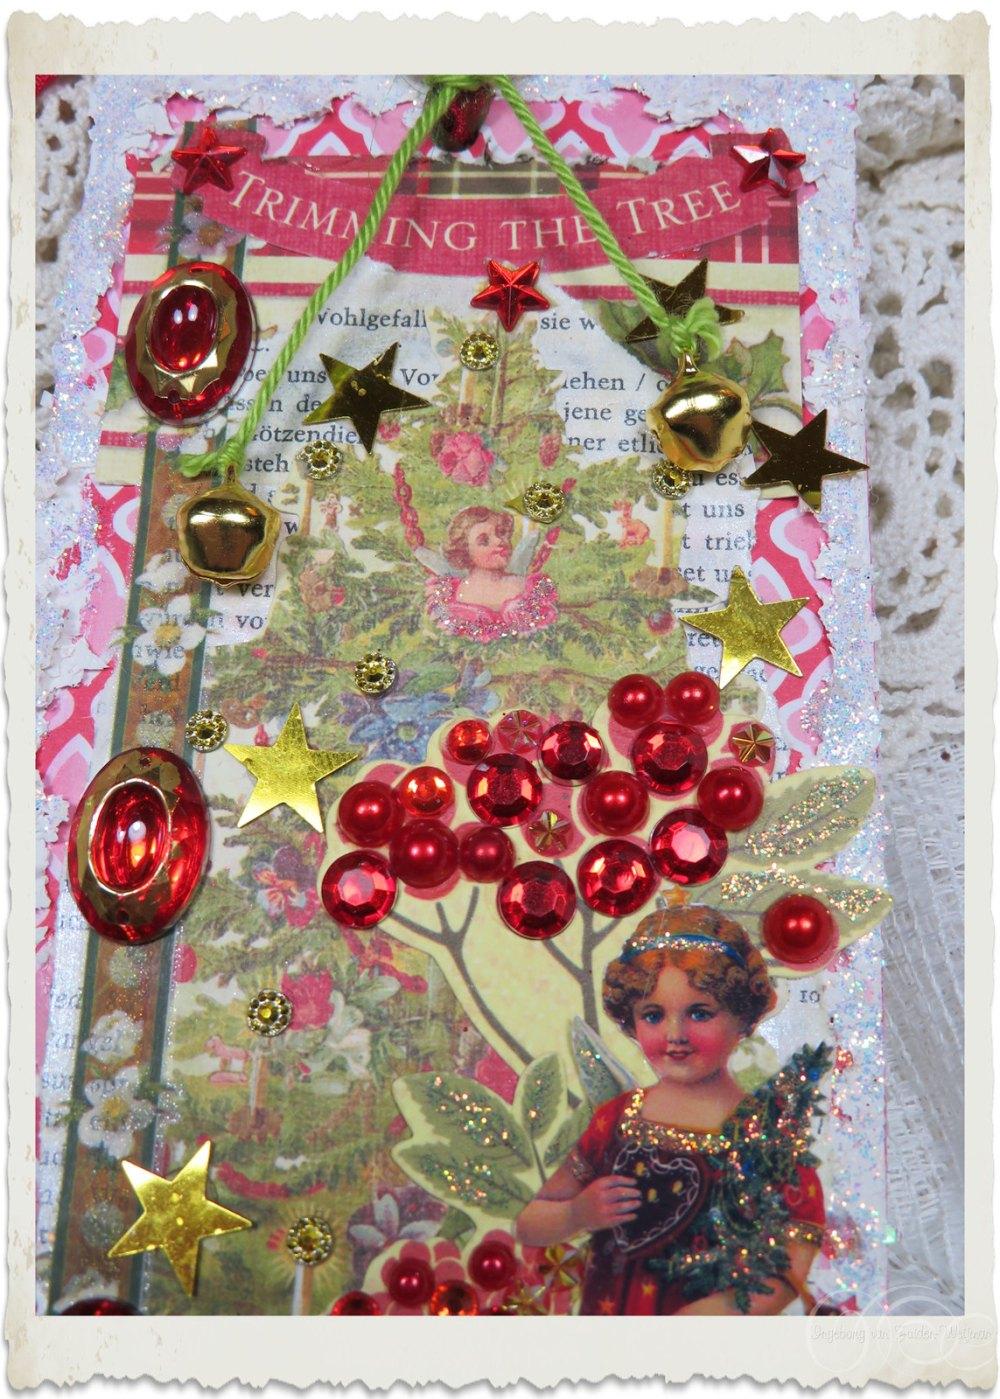 Christmas berries by Ingeborg van Zuiden